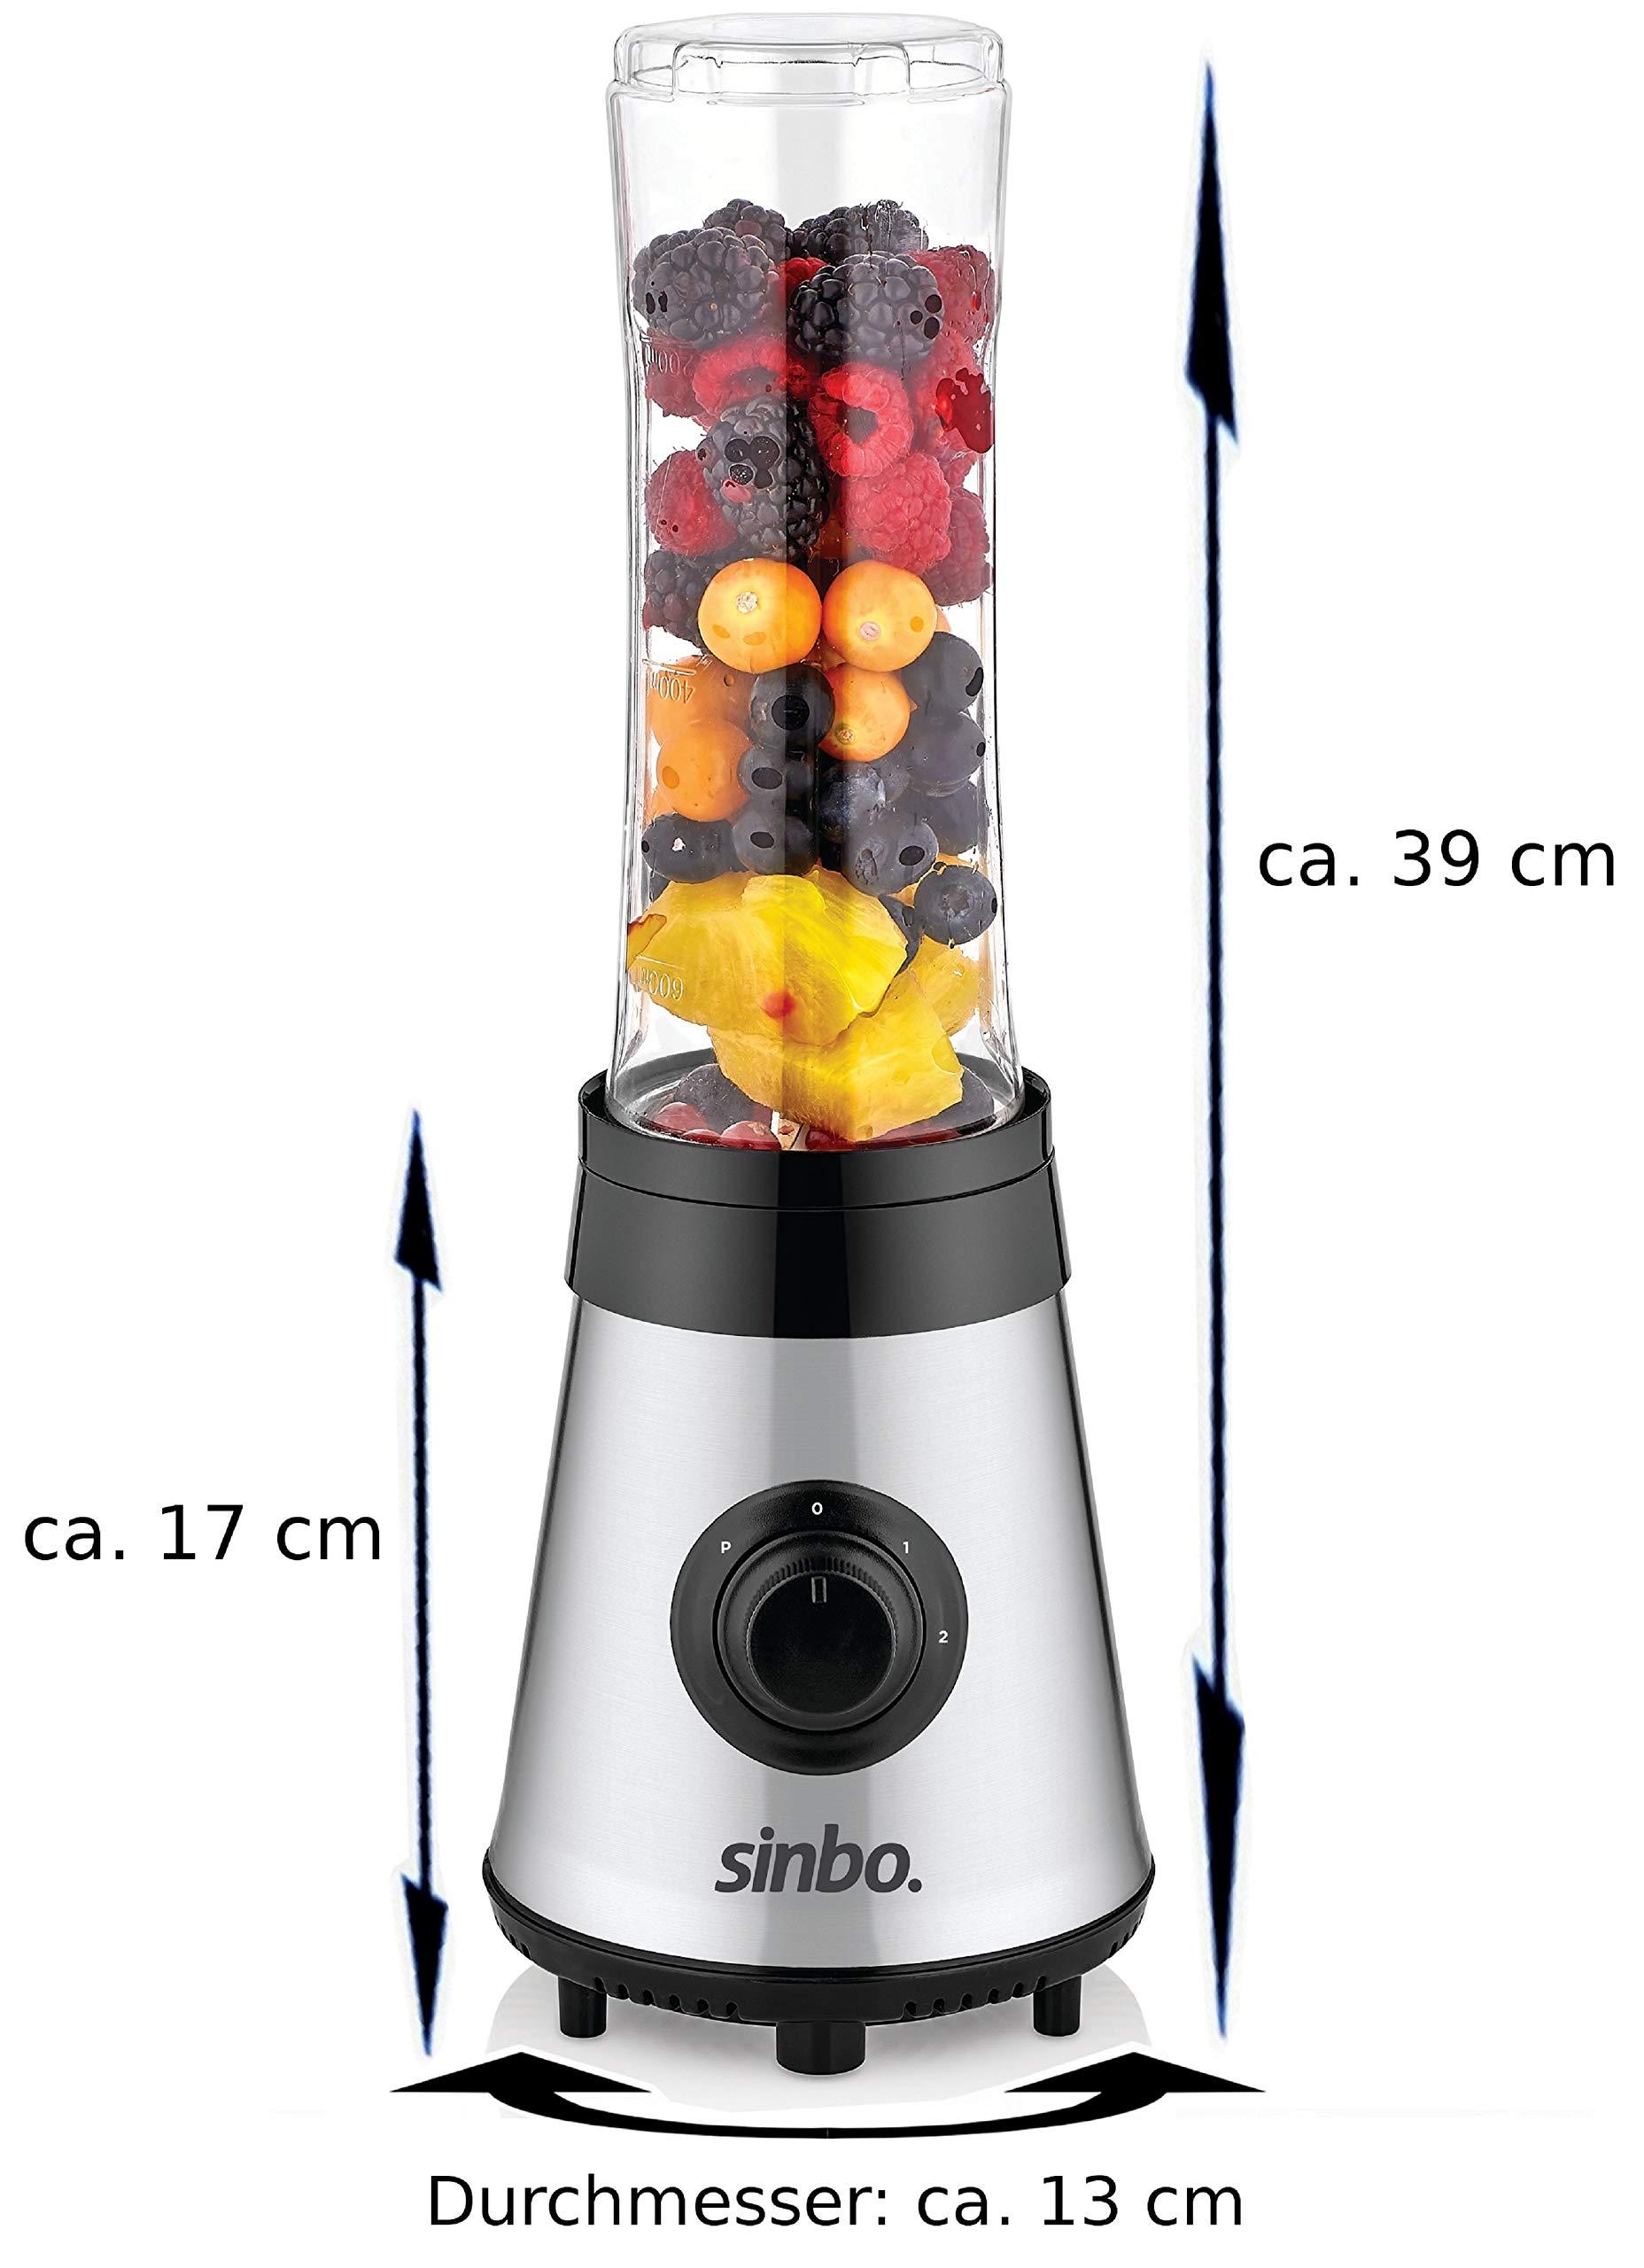 3in1-Standmixer-Smoothie-Maker-Kaffeemhle-Smoothie-to-go-Mixer-Universal-Mixer-Glas-Behlter-Universal-Power-Mixer-24000-Umin-Edelstahl-800ml-600ml-300ml-Behlter-BPA-FREI